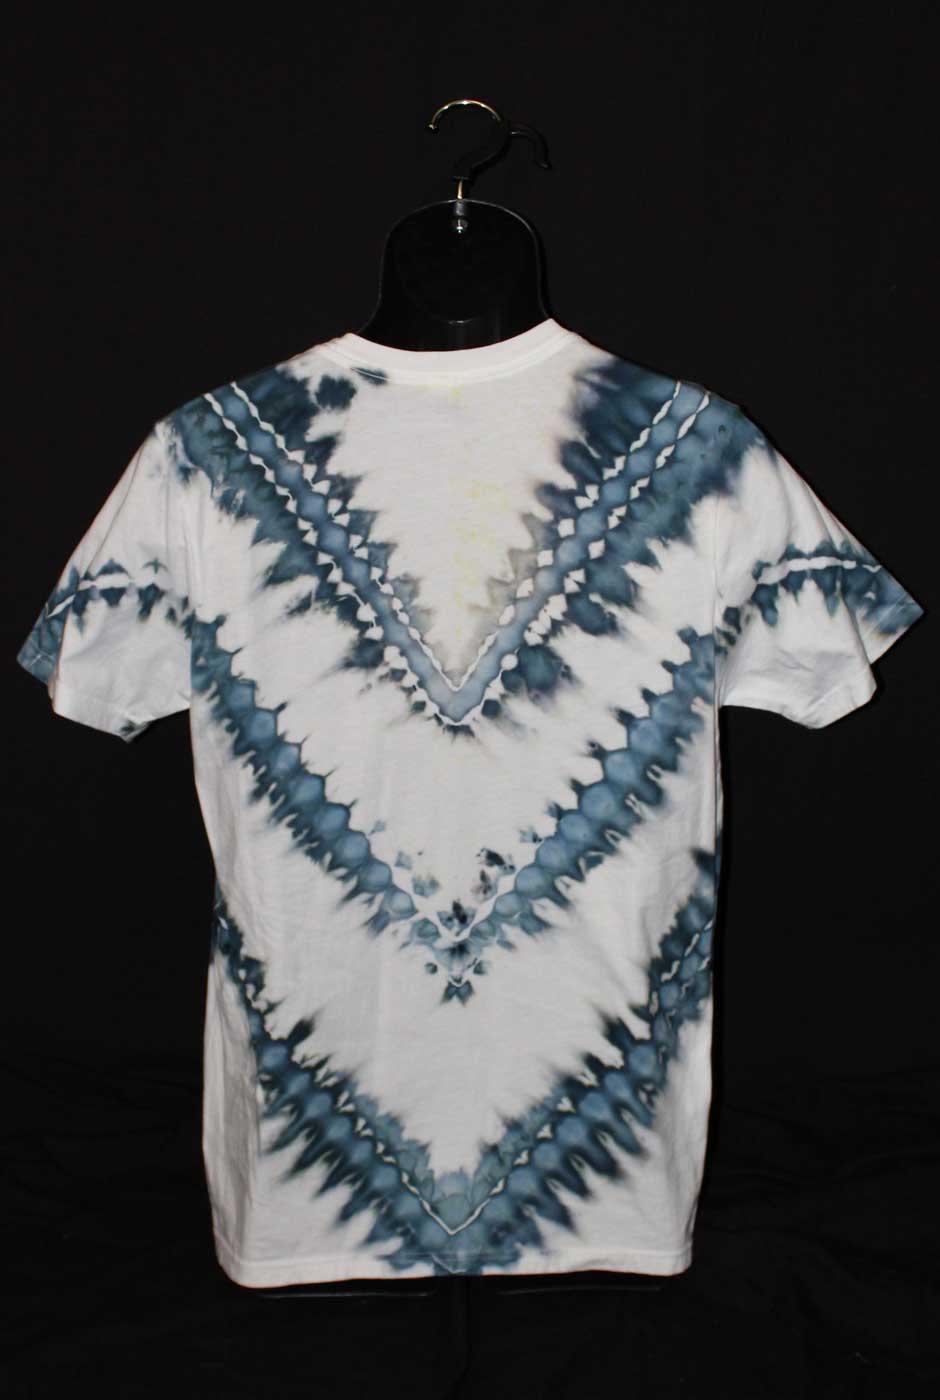 Prods Minimalist V Organic T Shirt Bp